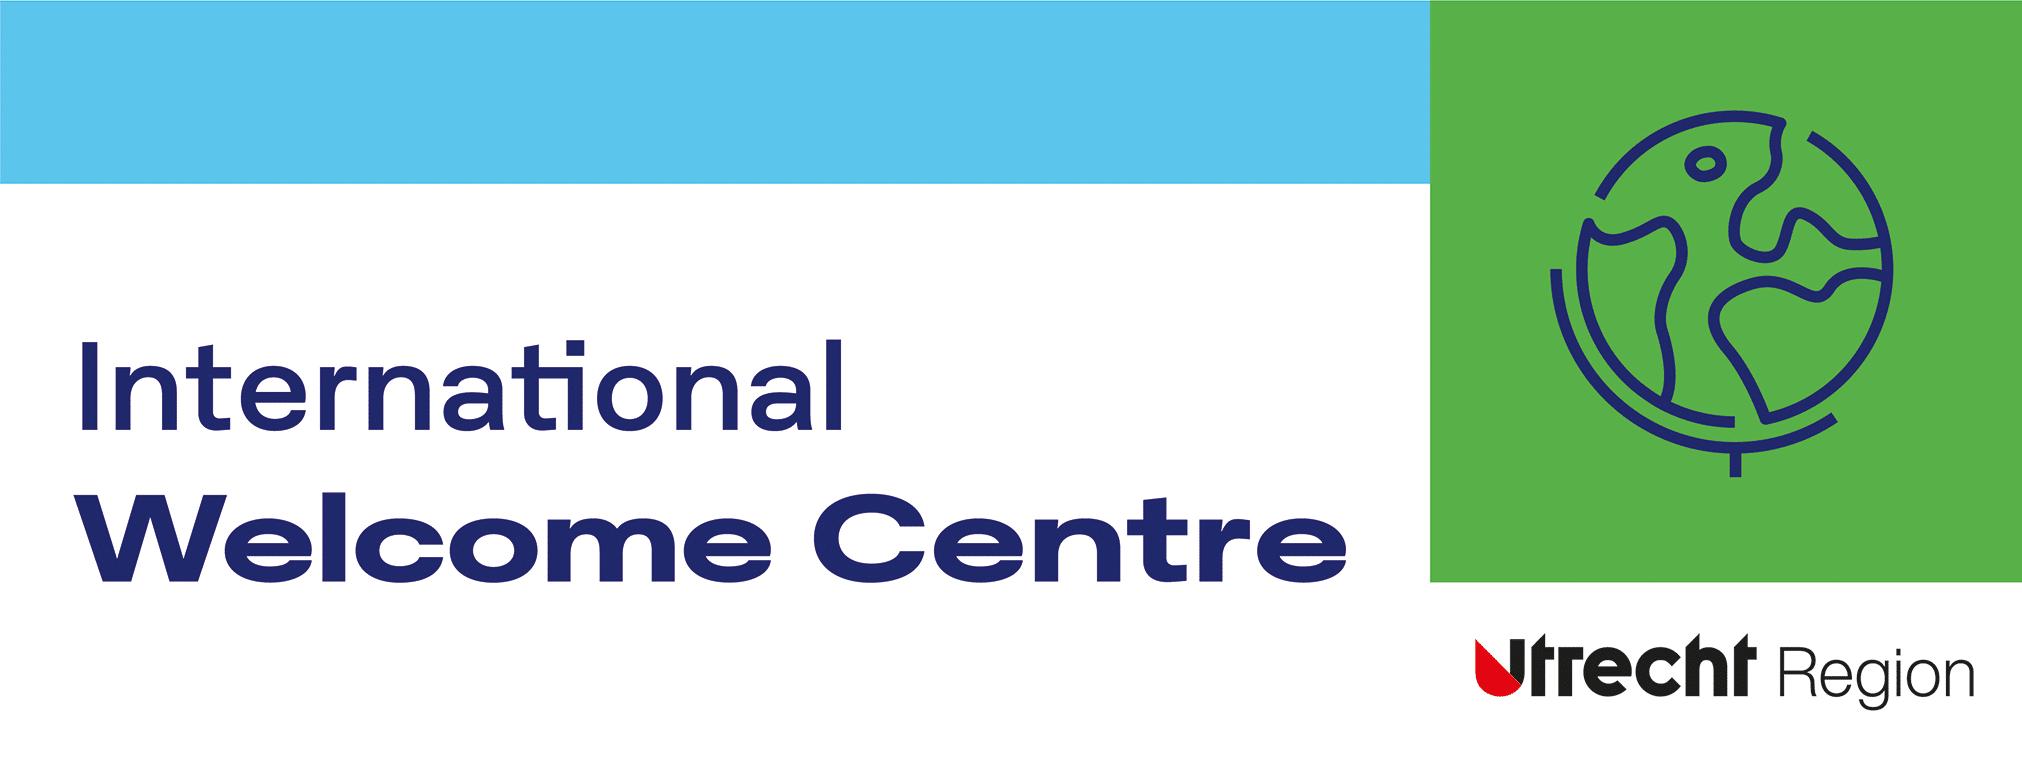 logo International Welcome Centre Utrecht Region